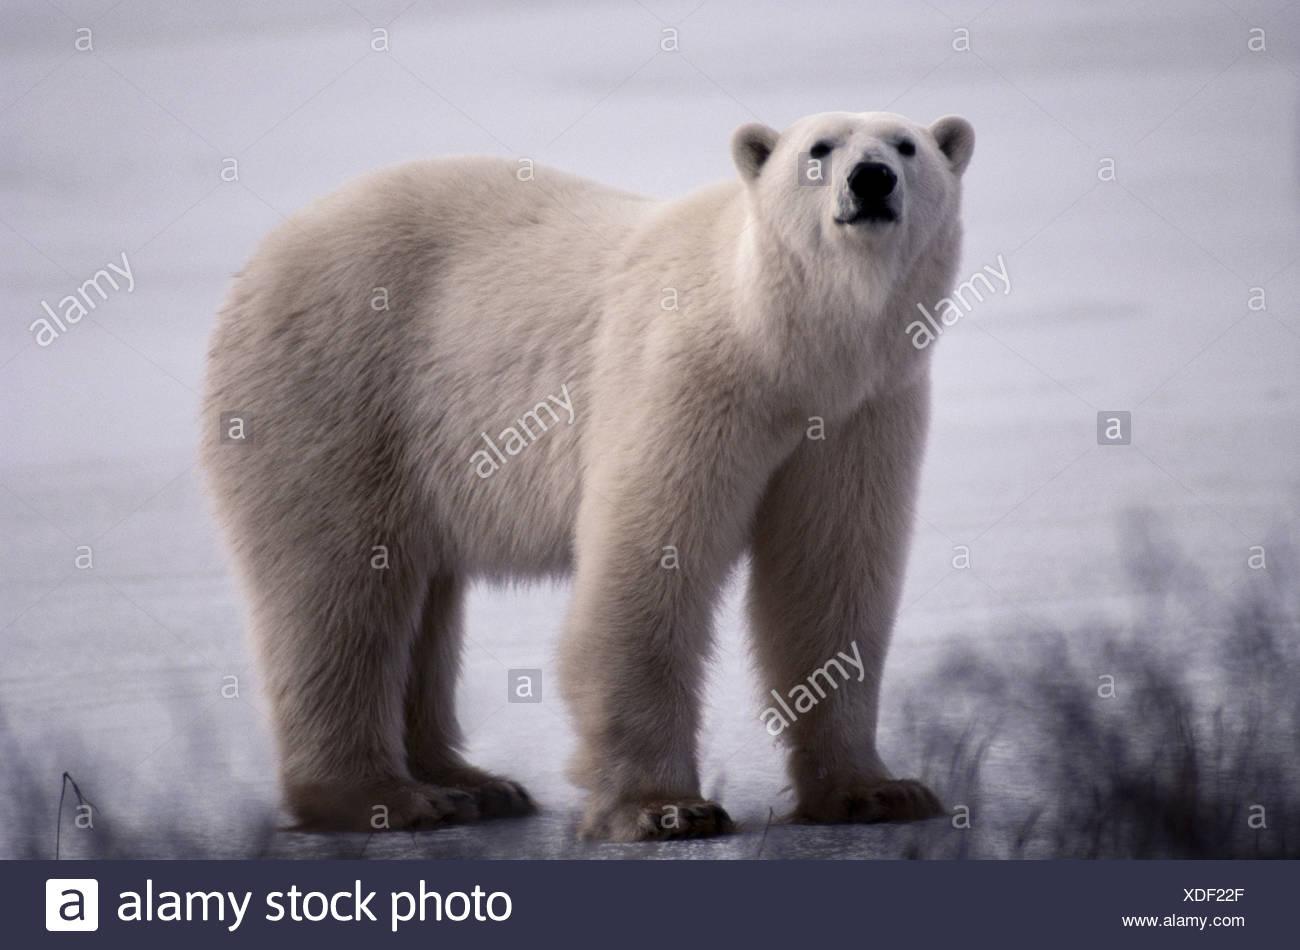 Polar bear, Canada - Stock Image